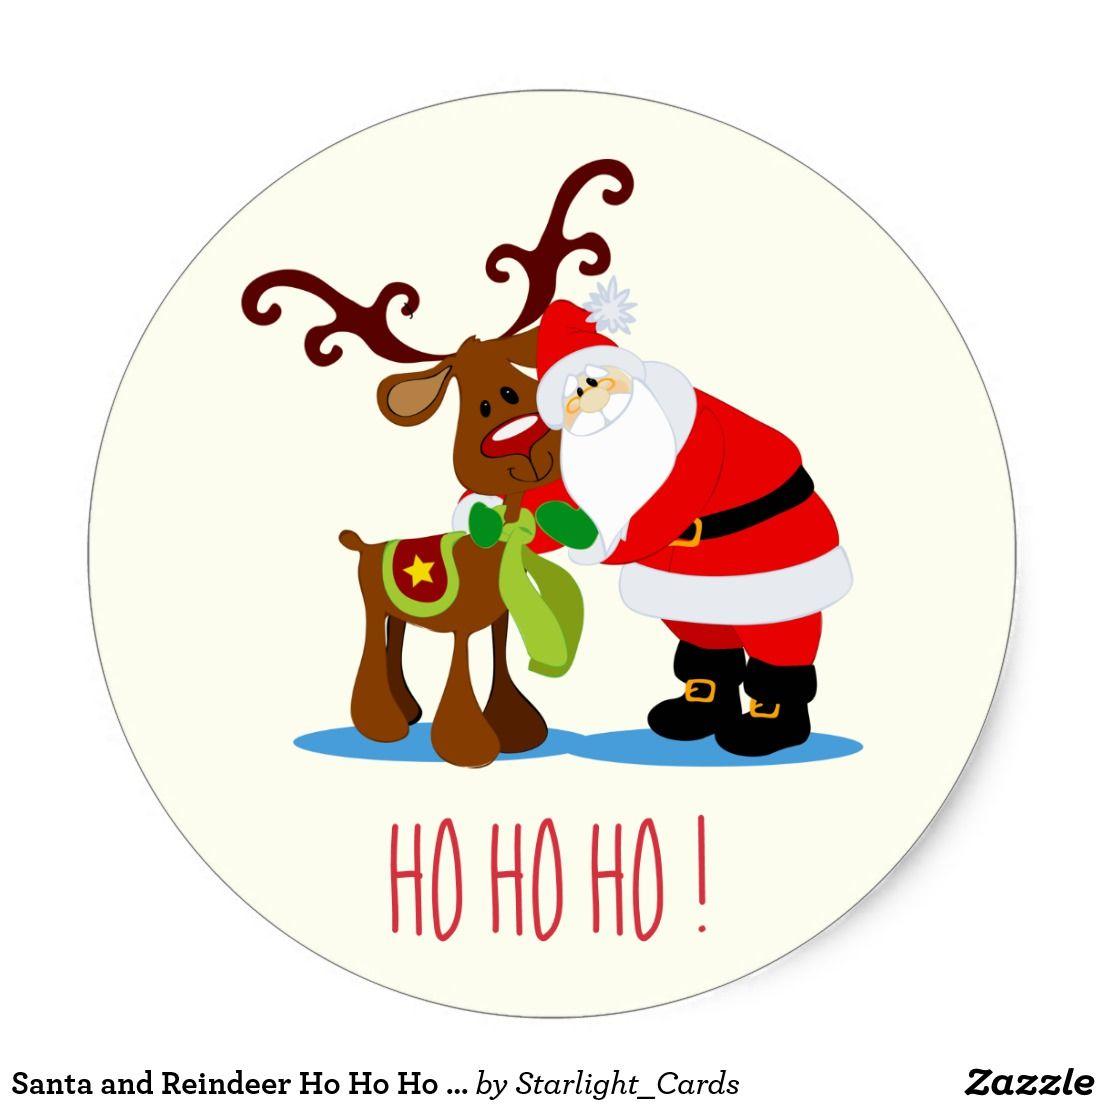 Santa And Reindeer Ho Ho Ho Christmas Classic Round Sticker Zazzle Com Christmas Stencils Christmas Gift Tags Printable Christmas Images Free